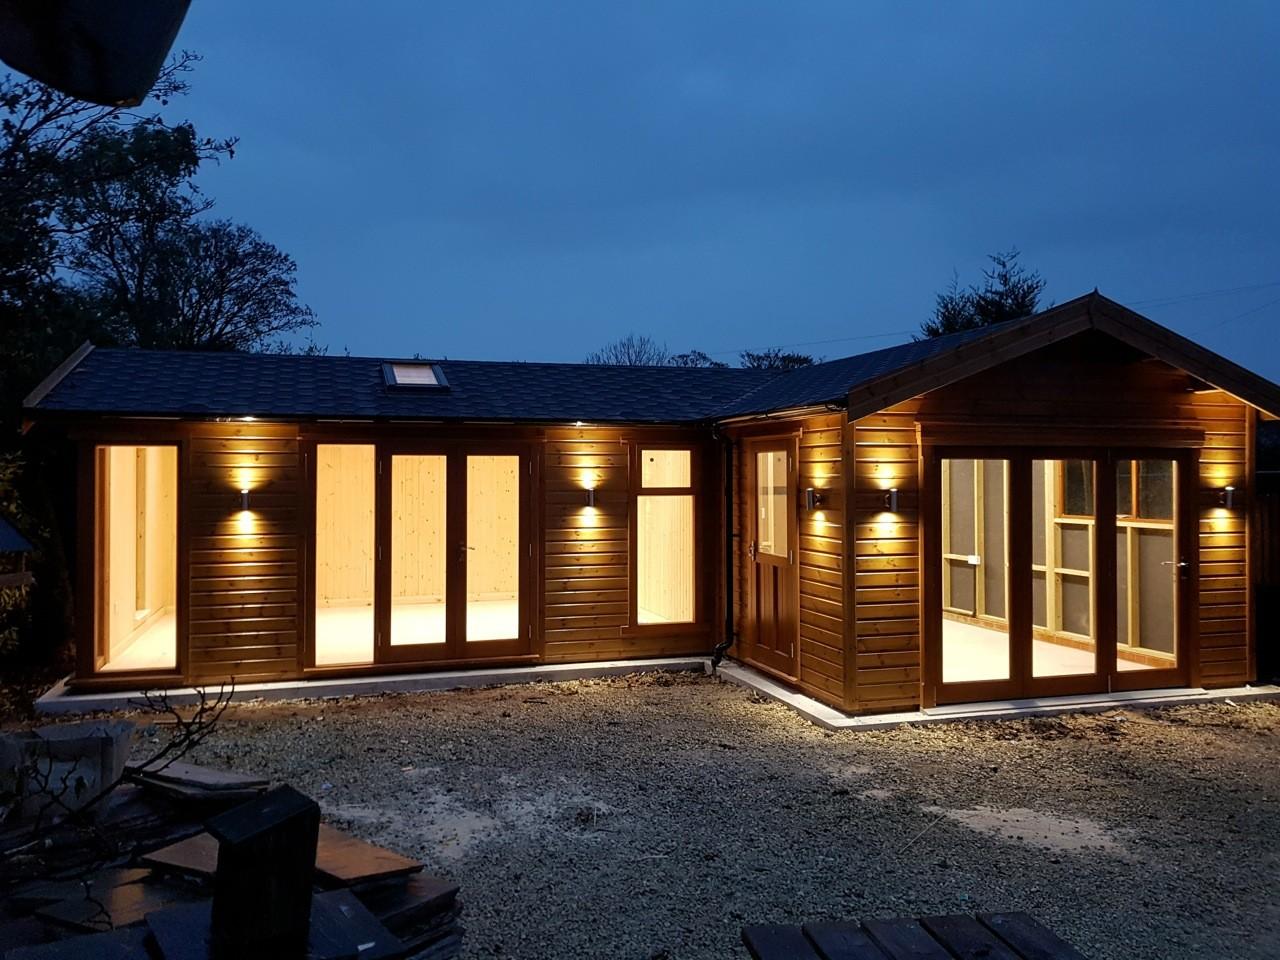 Bespoke garden studio tunstall garden buildings 5 for Garden studio